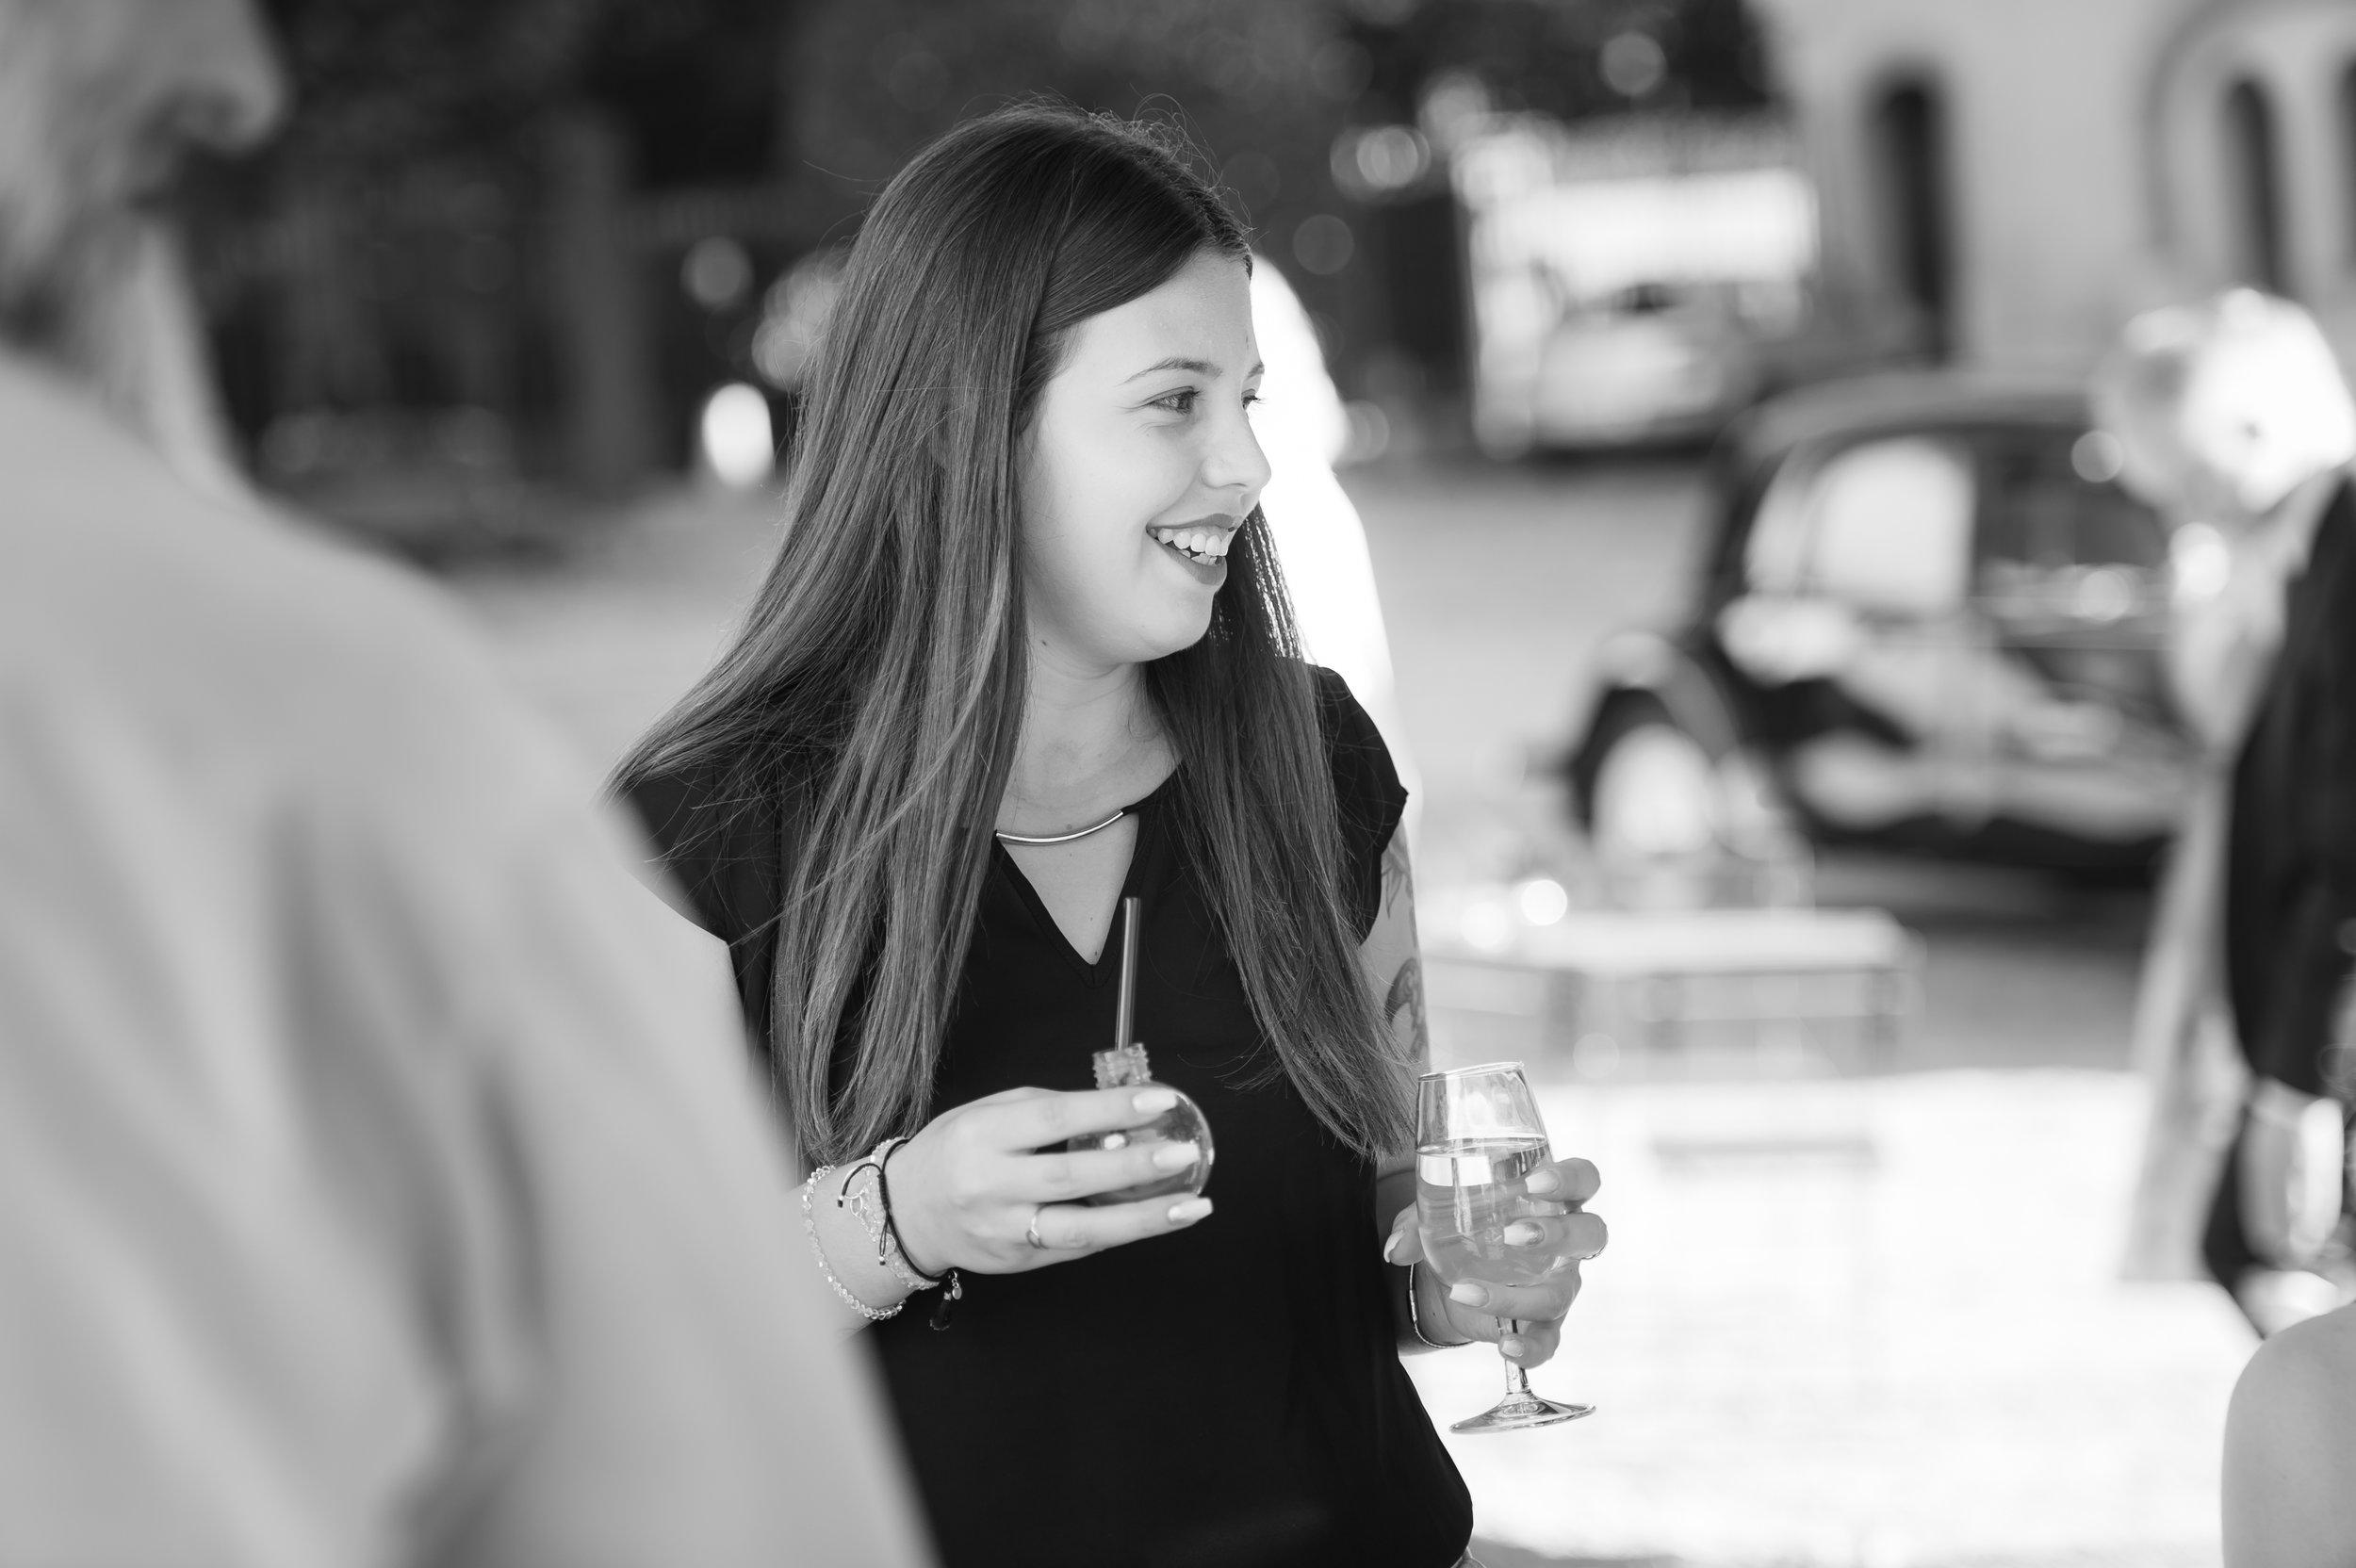 nadine_leon-296.jpg